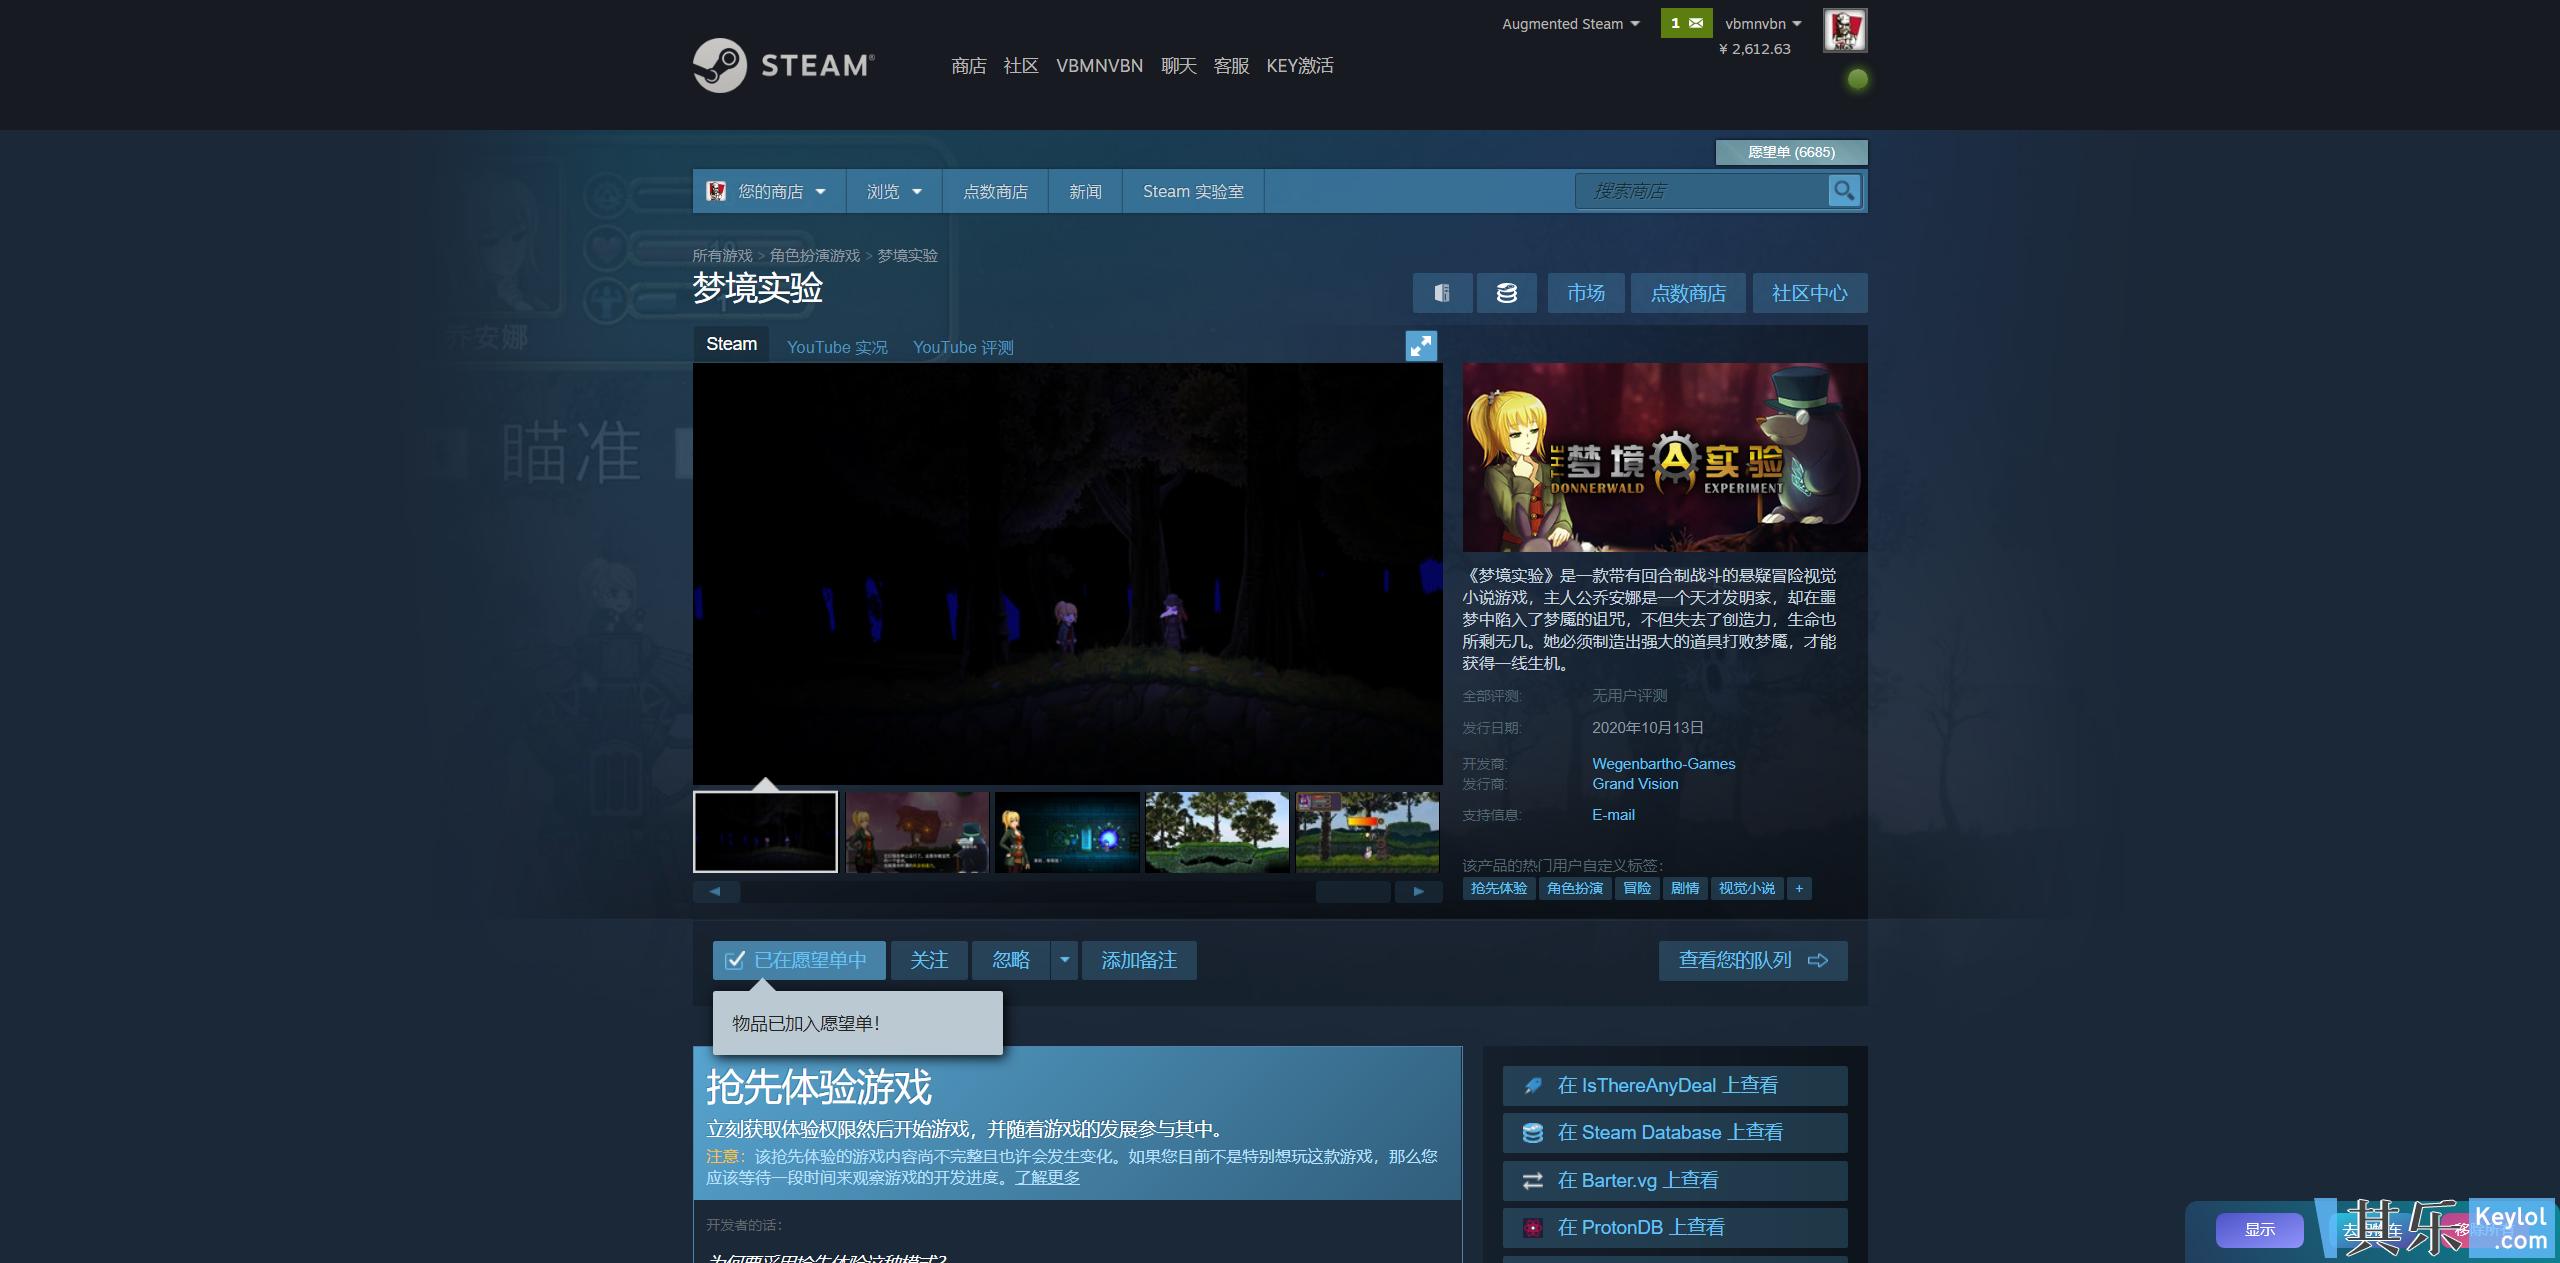 FireShot Capture 003 - Steam 上的 梦境实验 - store.steampowered.com.png